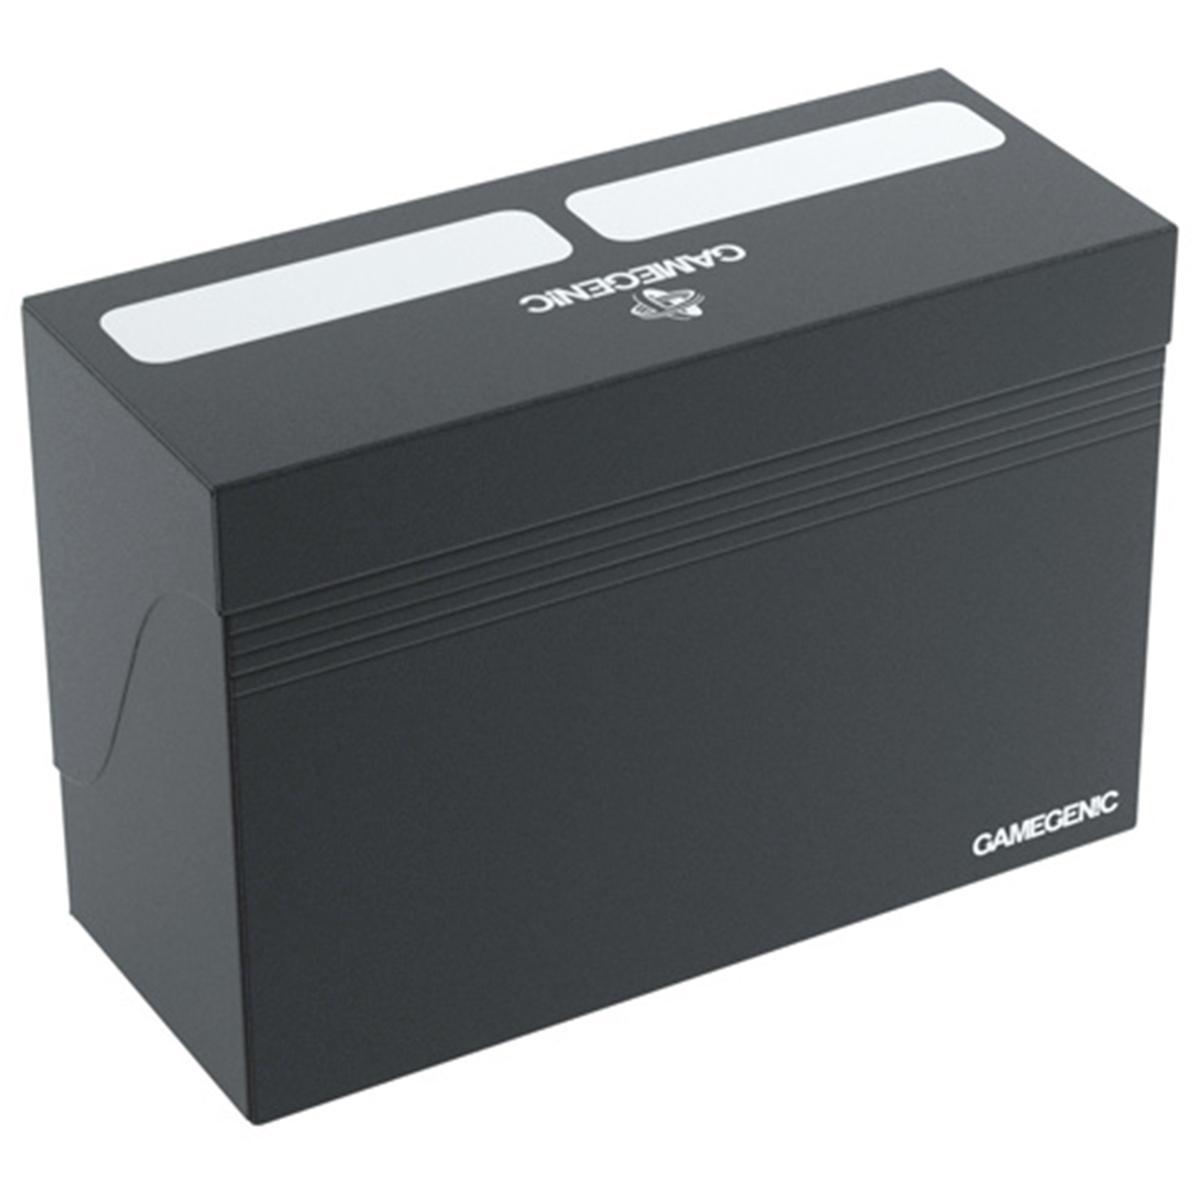 Deck Box Double Holder 160 + Gamegenic